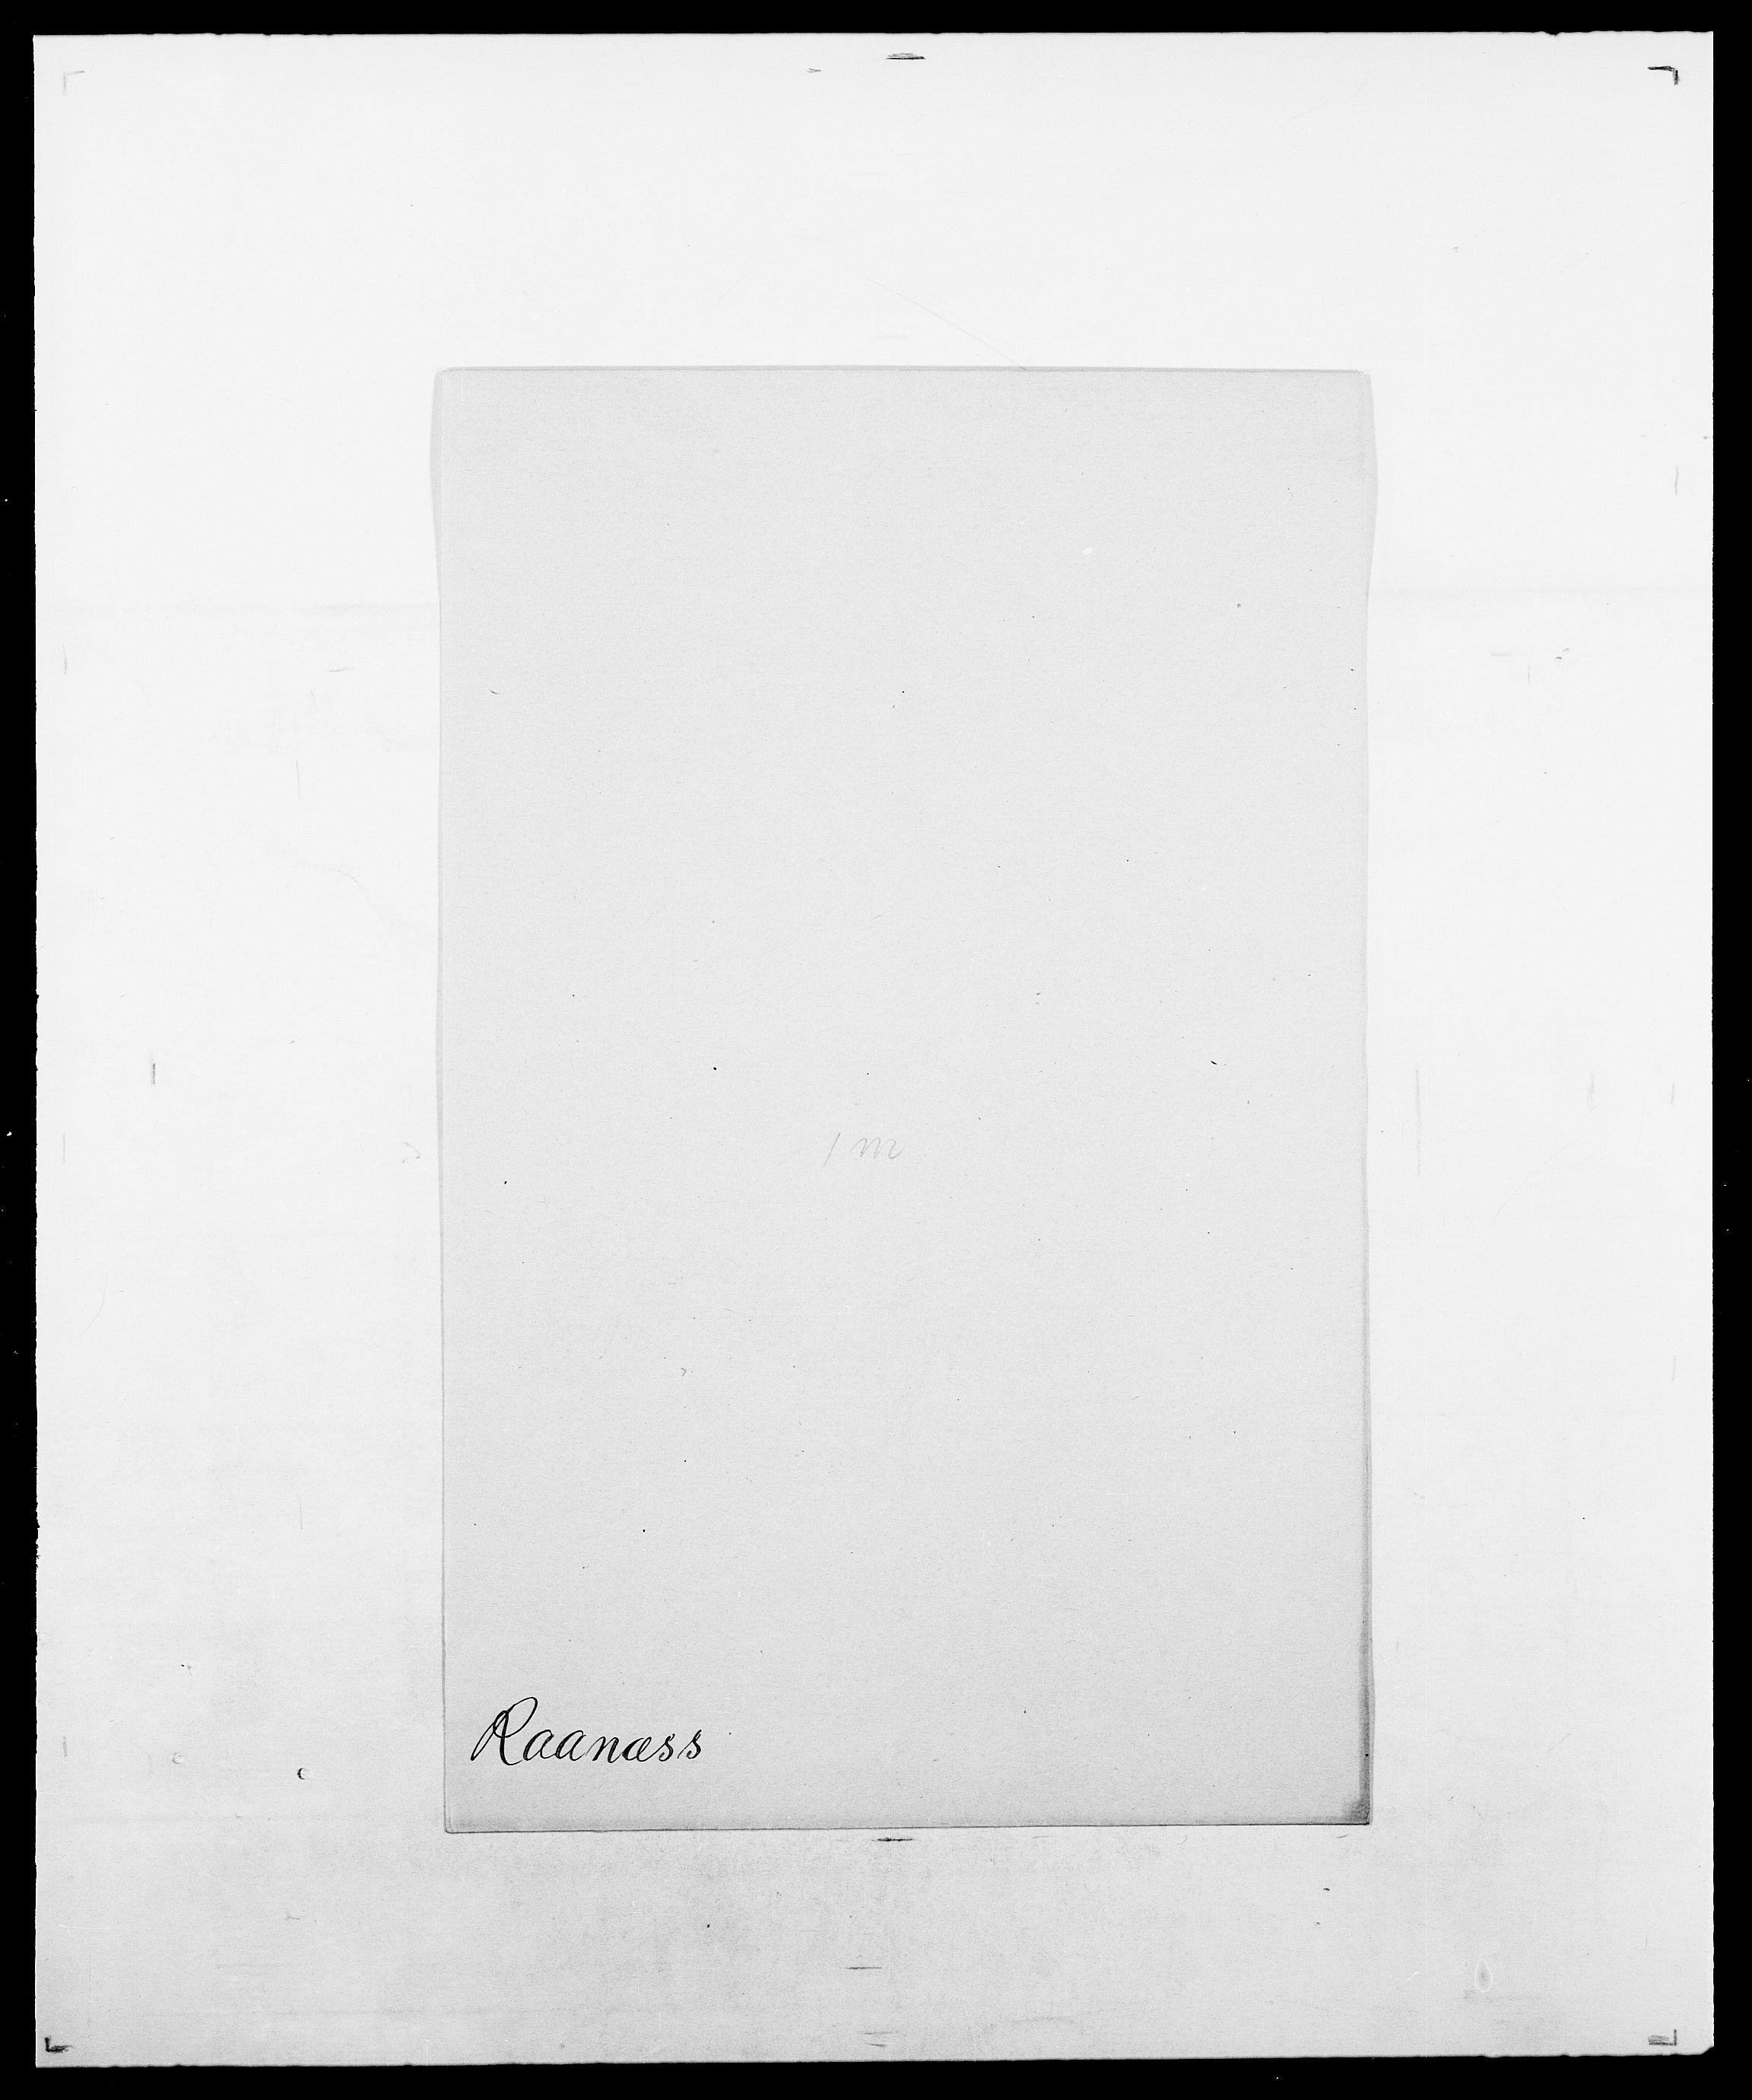 SAO, Delgobe, Charles Antoine - samling, D/Da/L0031: de Place - Raaum, s. 534